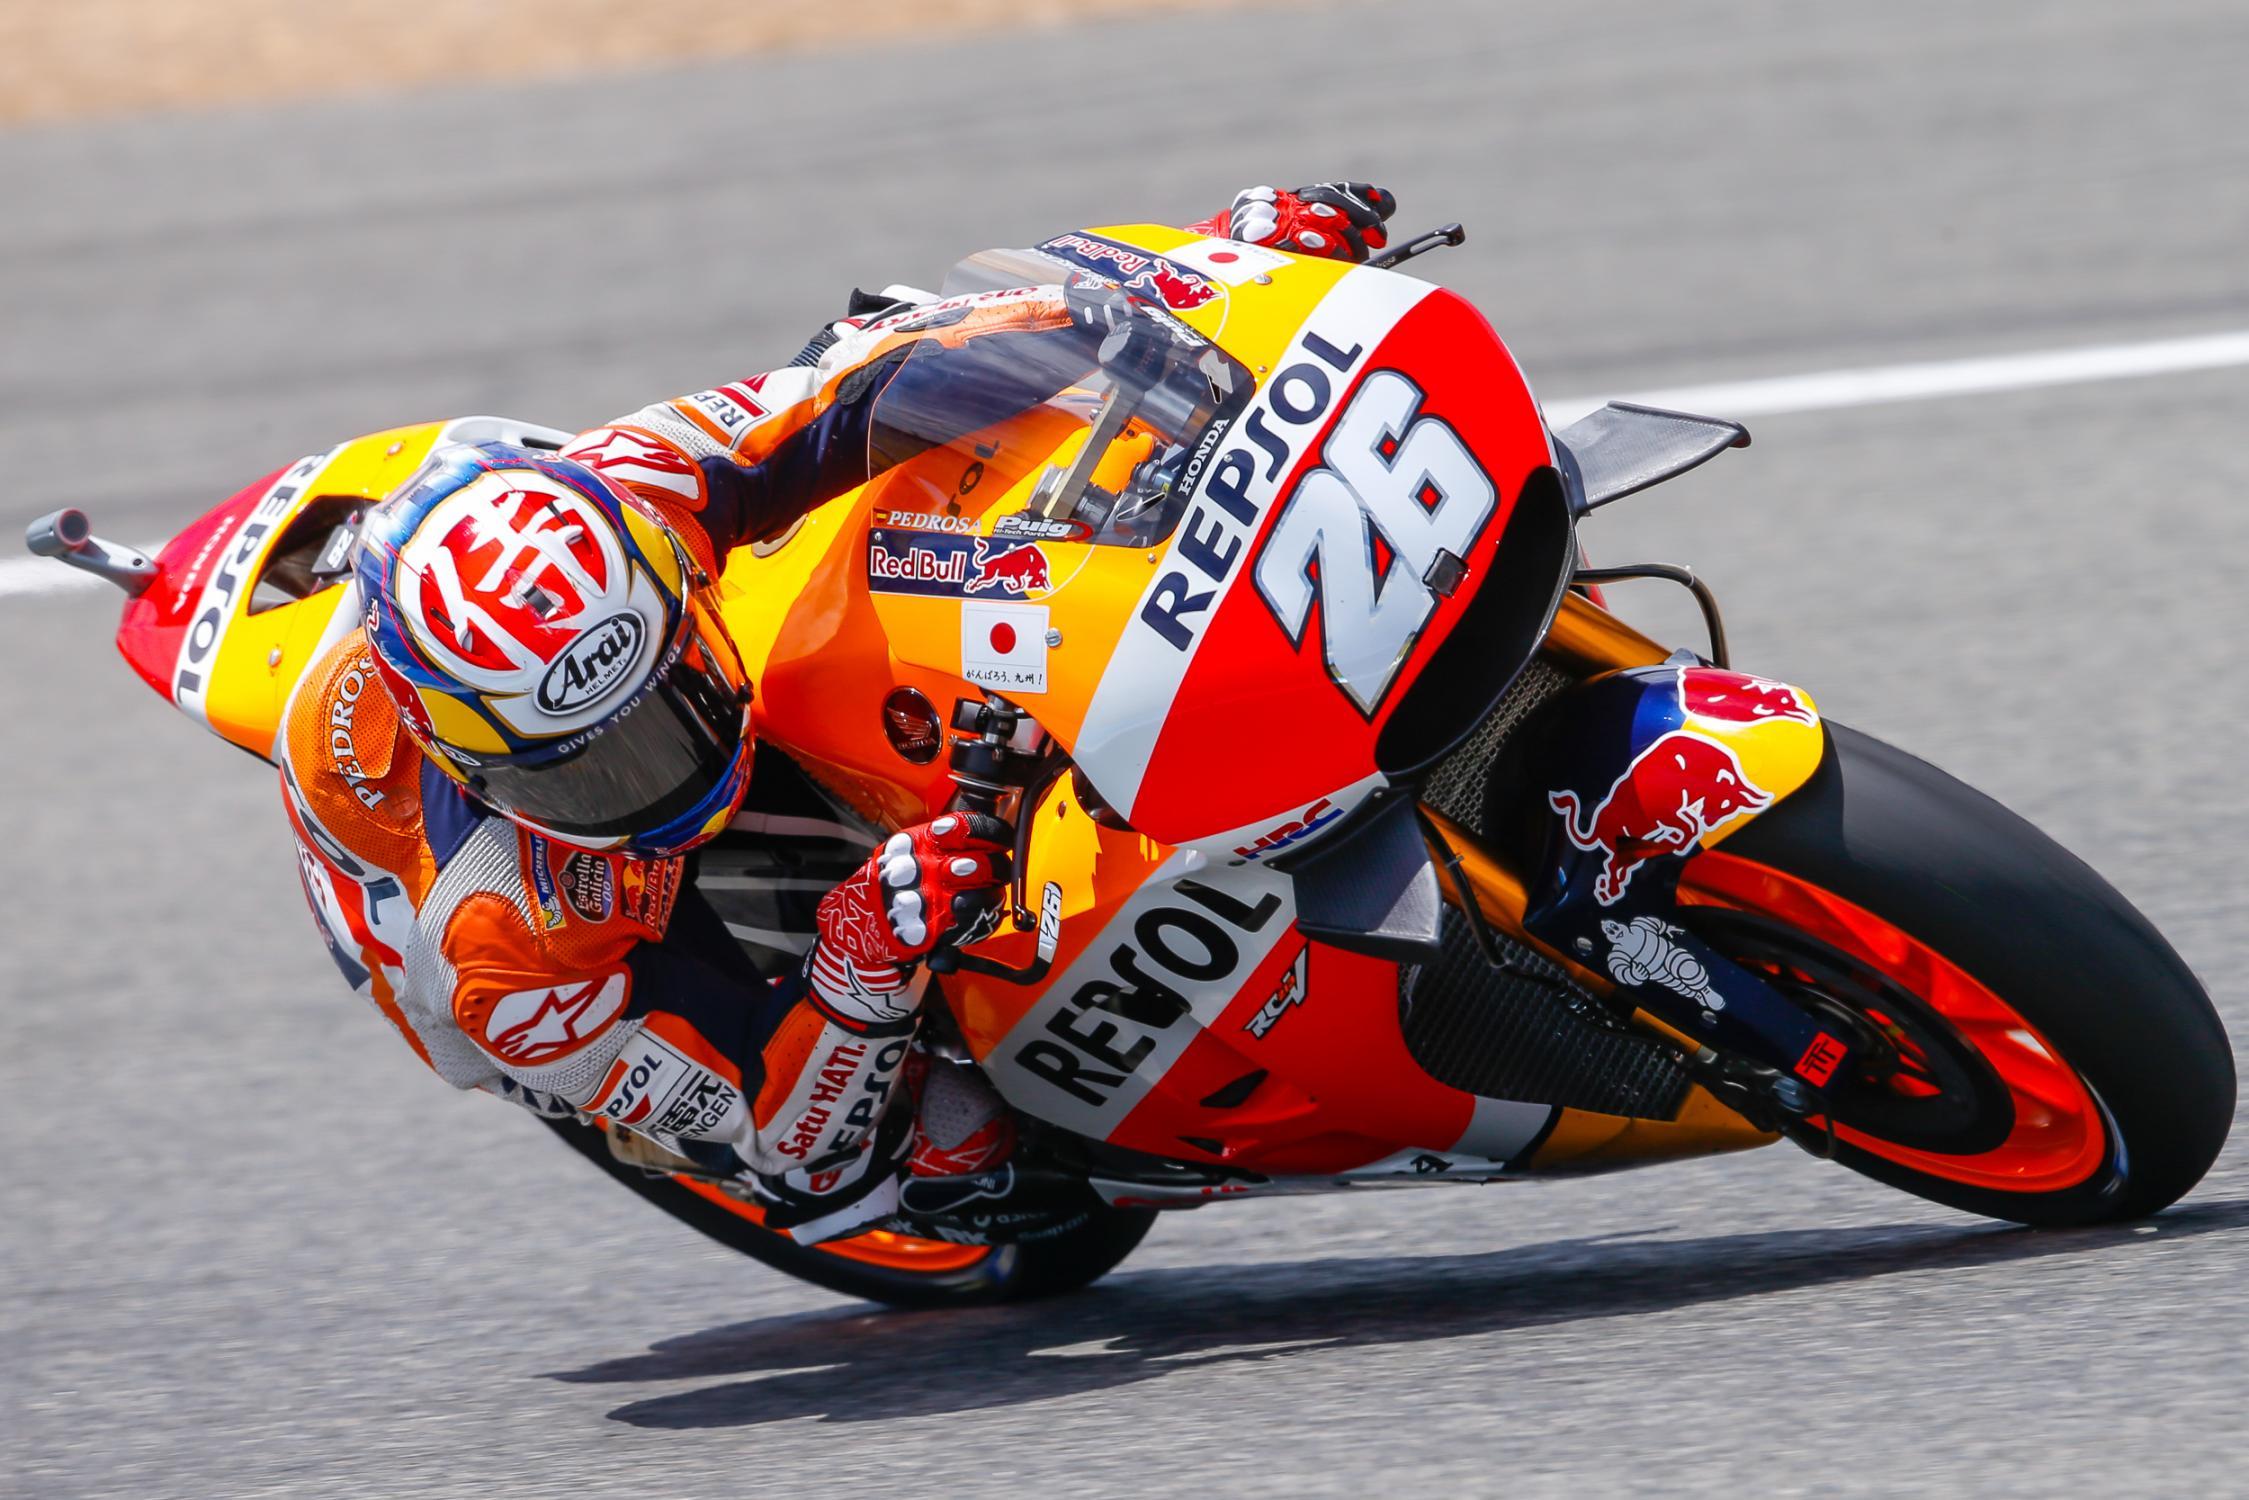 [GP] Jerez 26-dani-pedrosa-esp_gp_0304.gallery_full_top_fullscreen